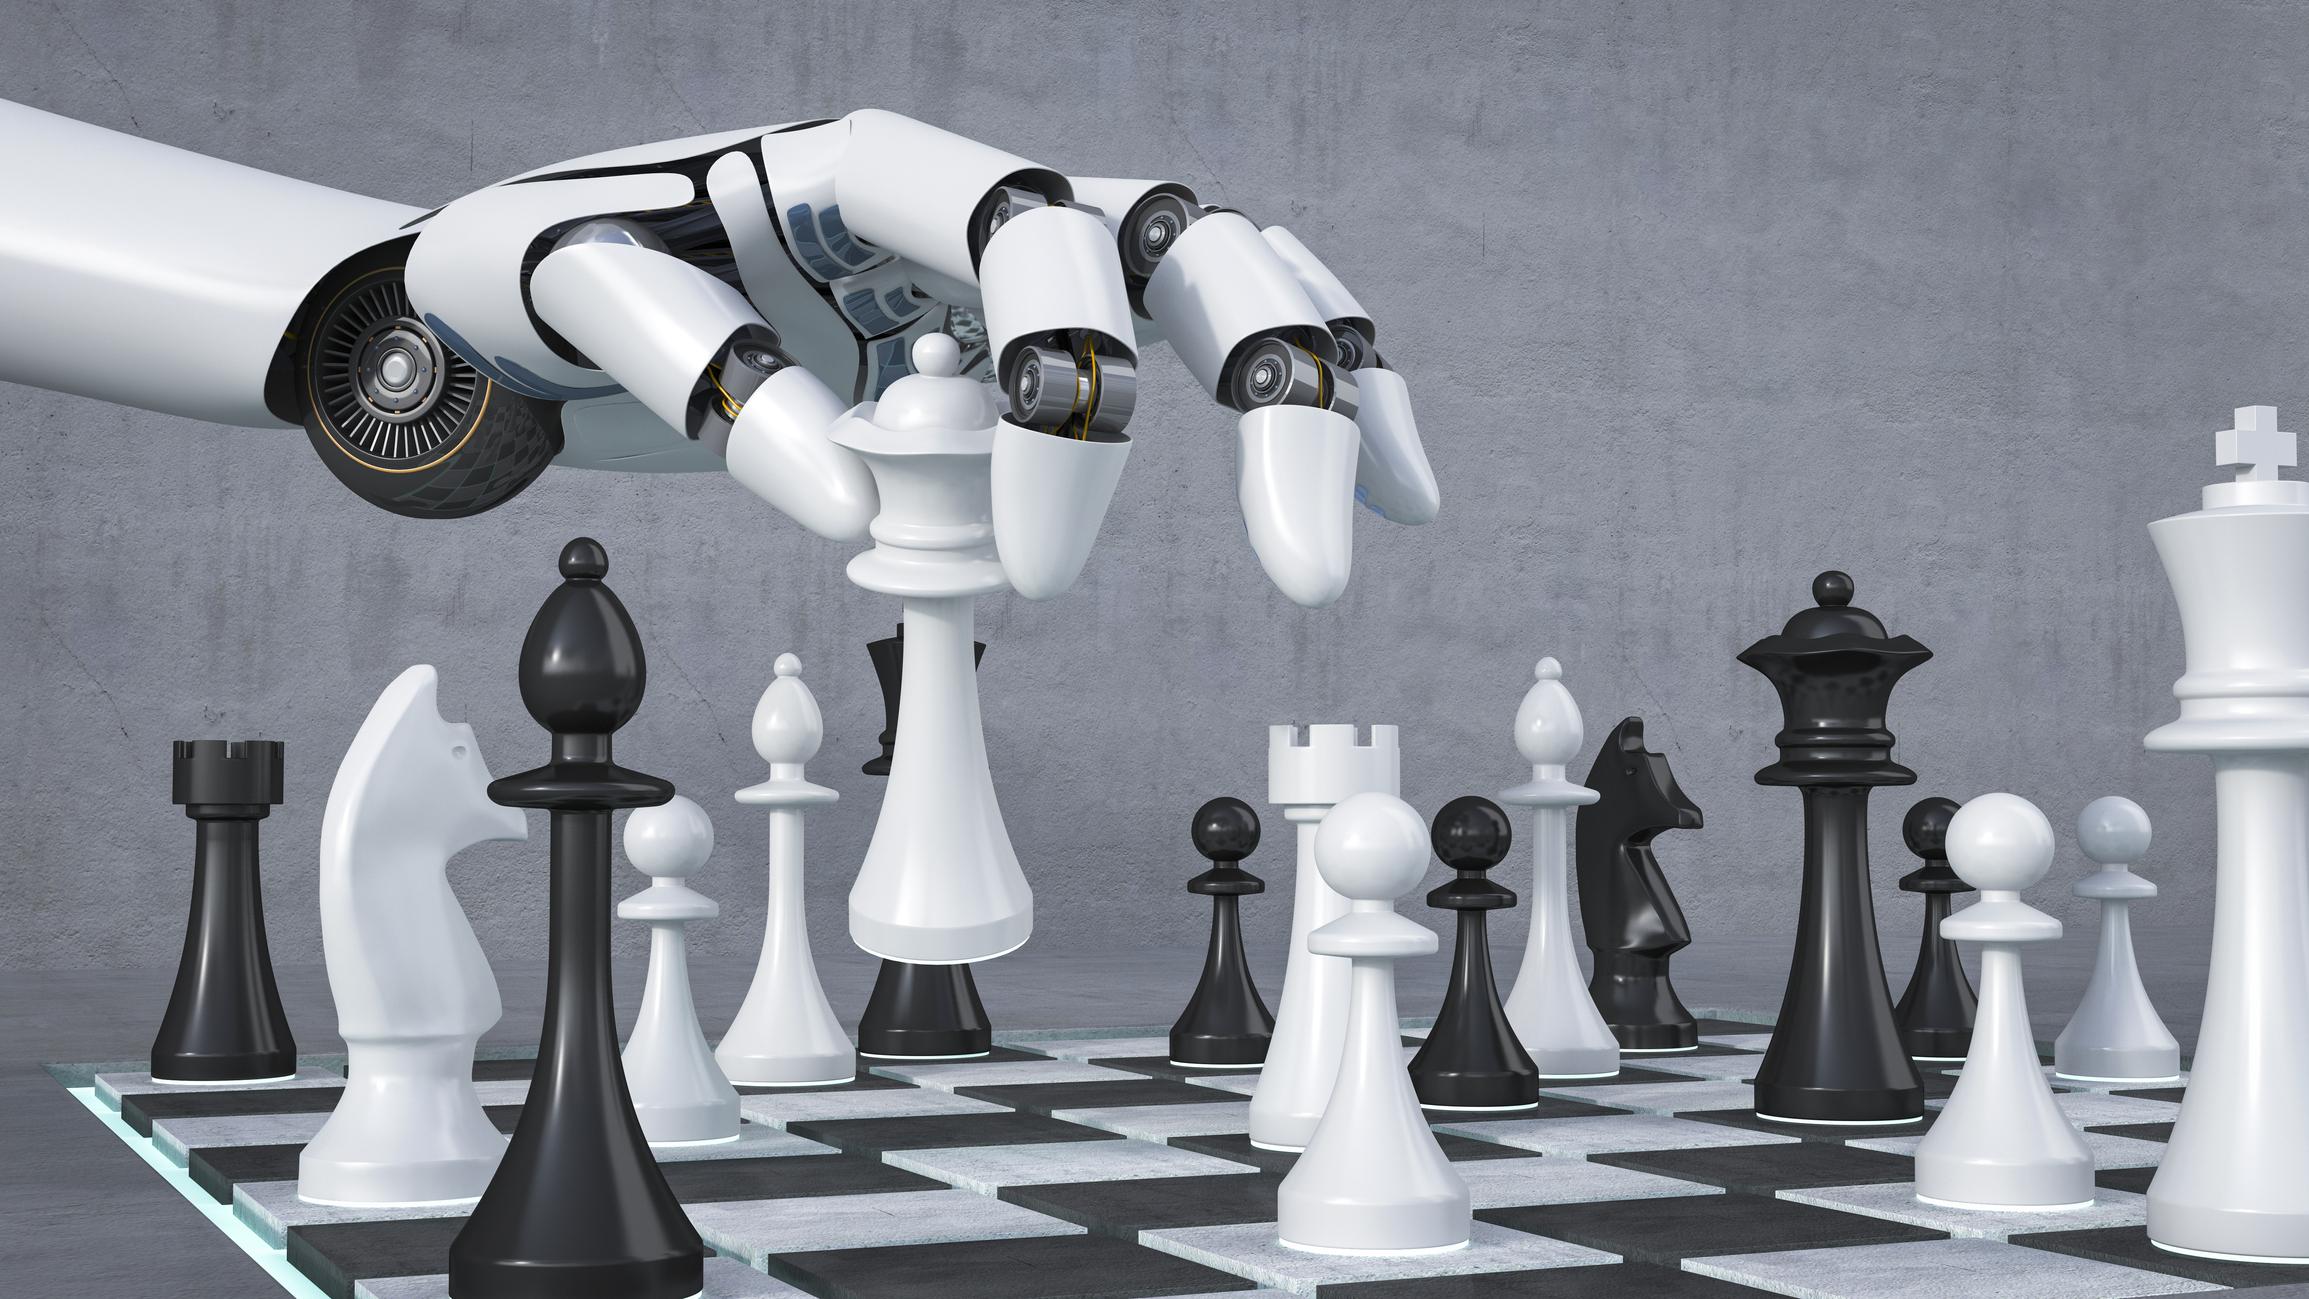 A CTO brings a strategic advantage